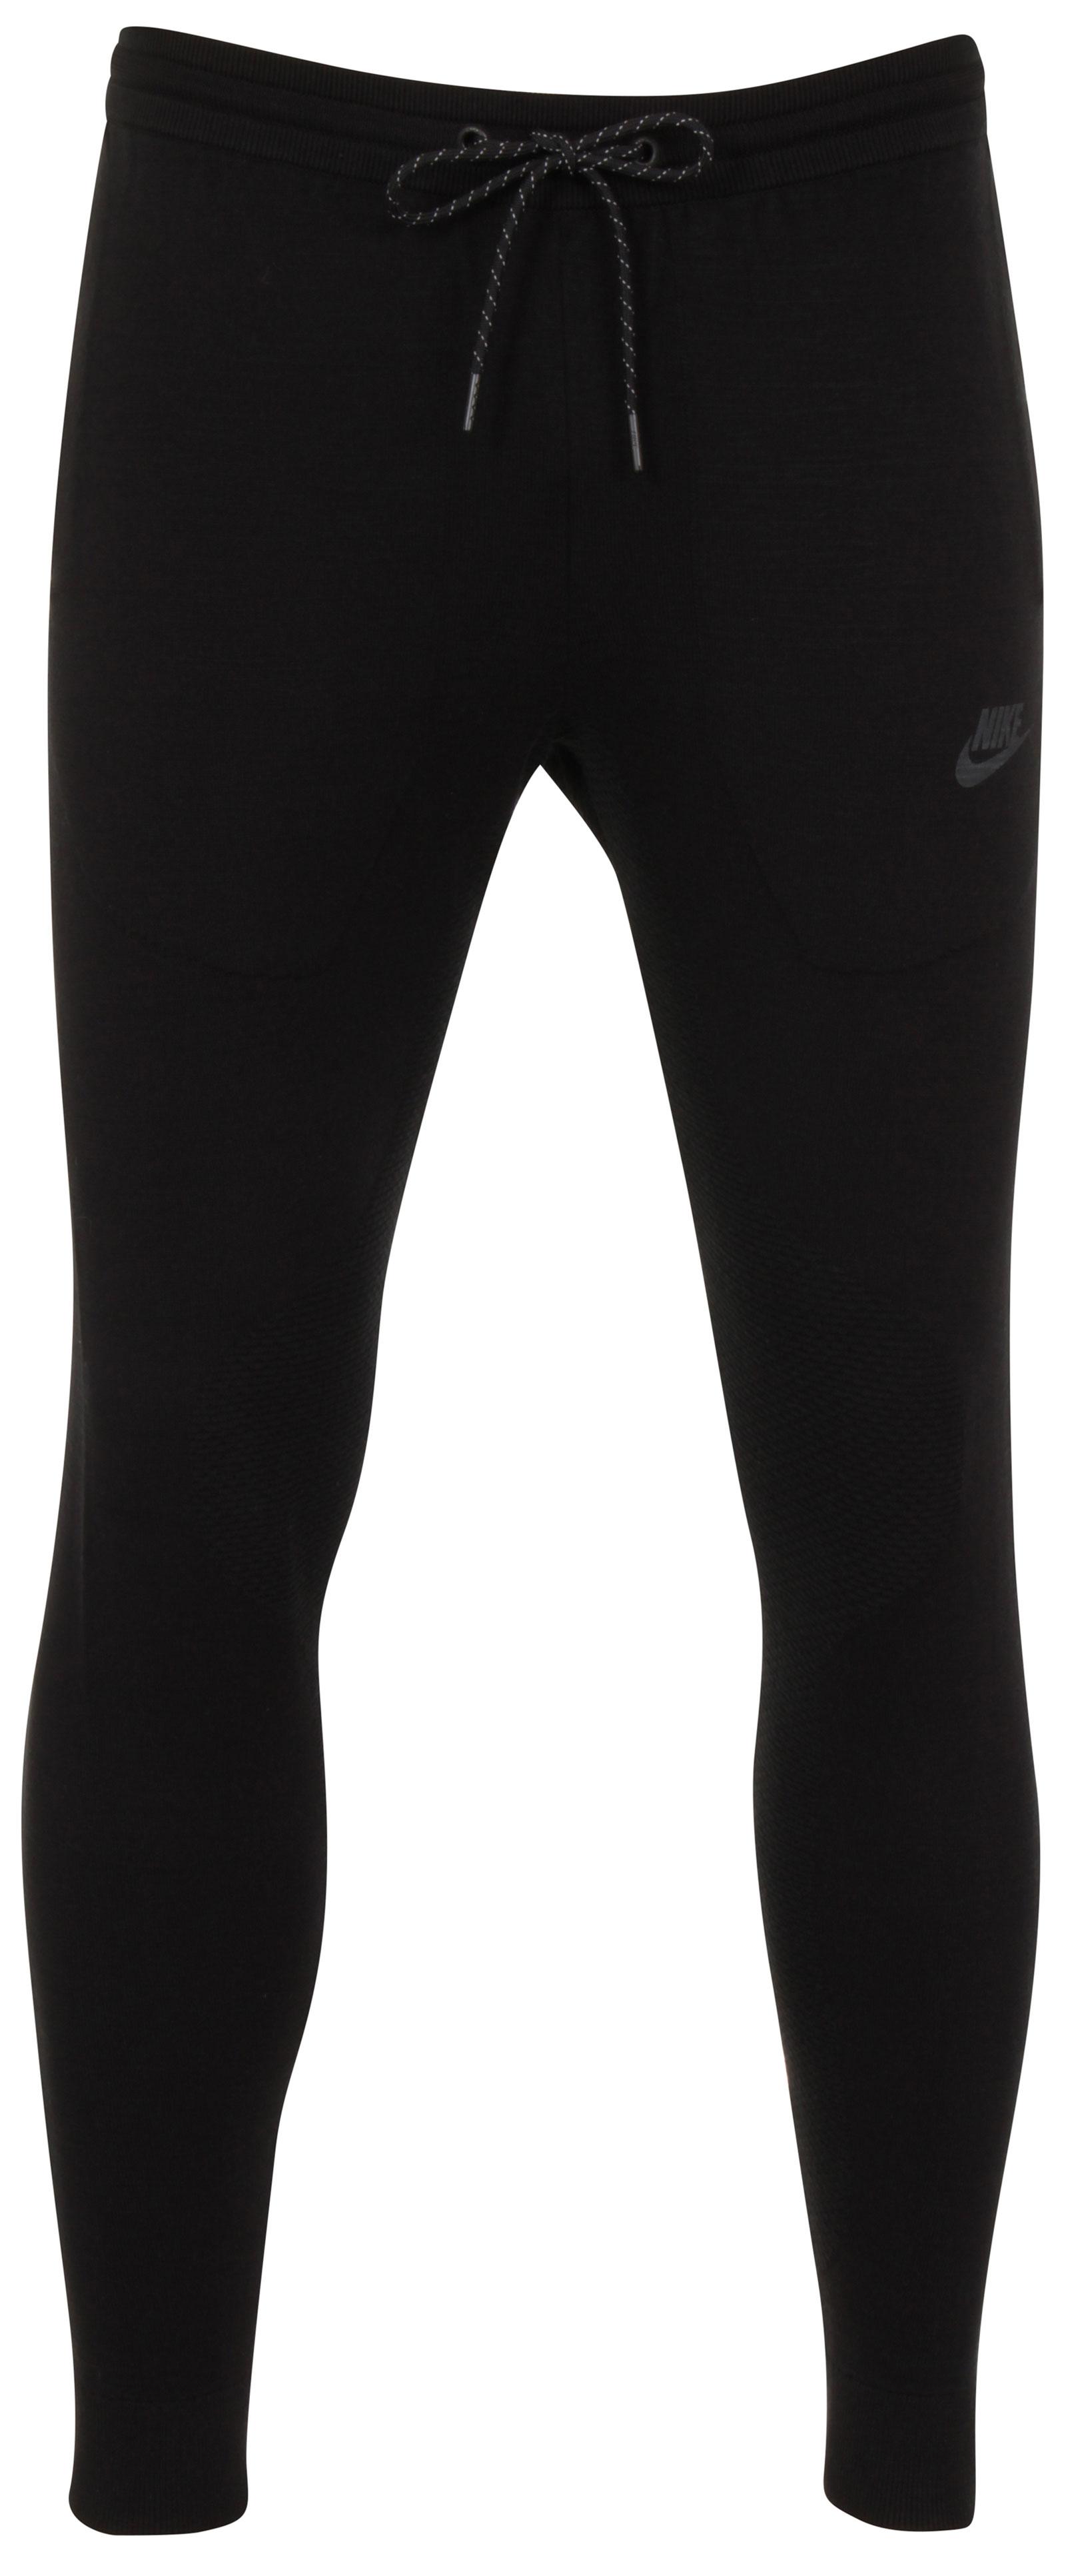 check out 5197f e9cf3 La foto se está cargando Nuevo-Nike-Sportswear-Tech-Fleece-810560-Negro-para -